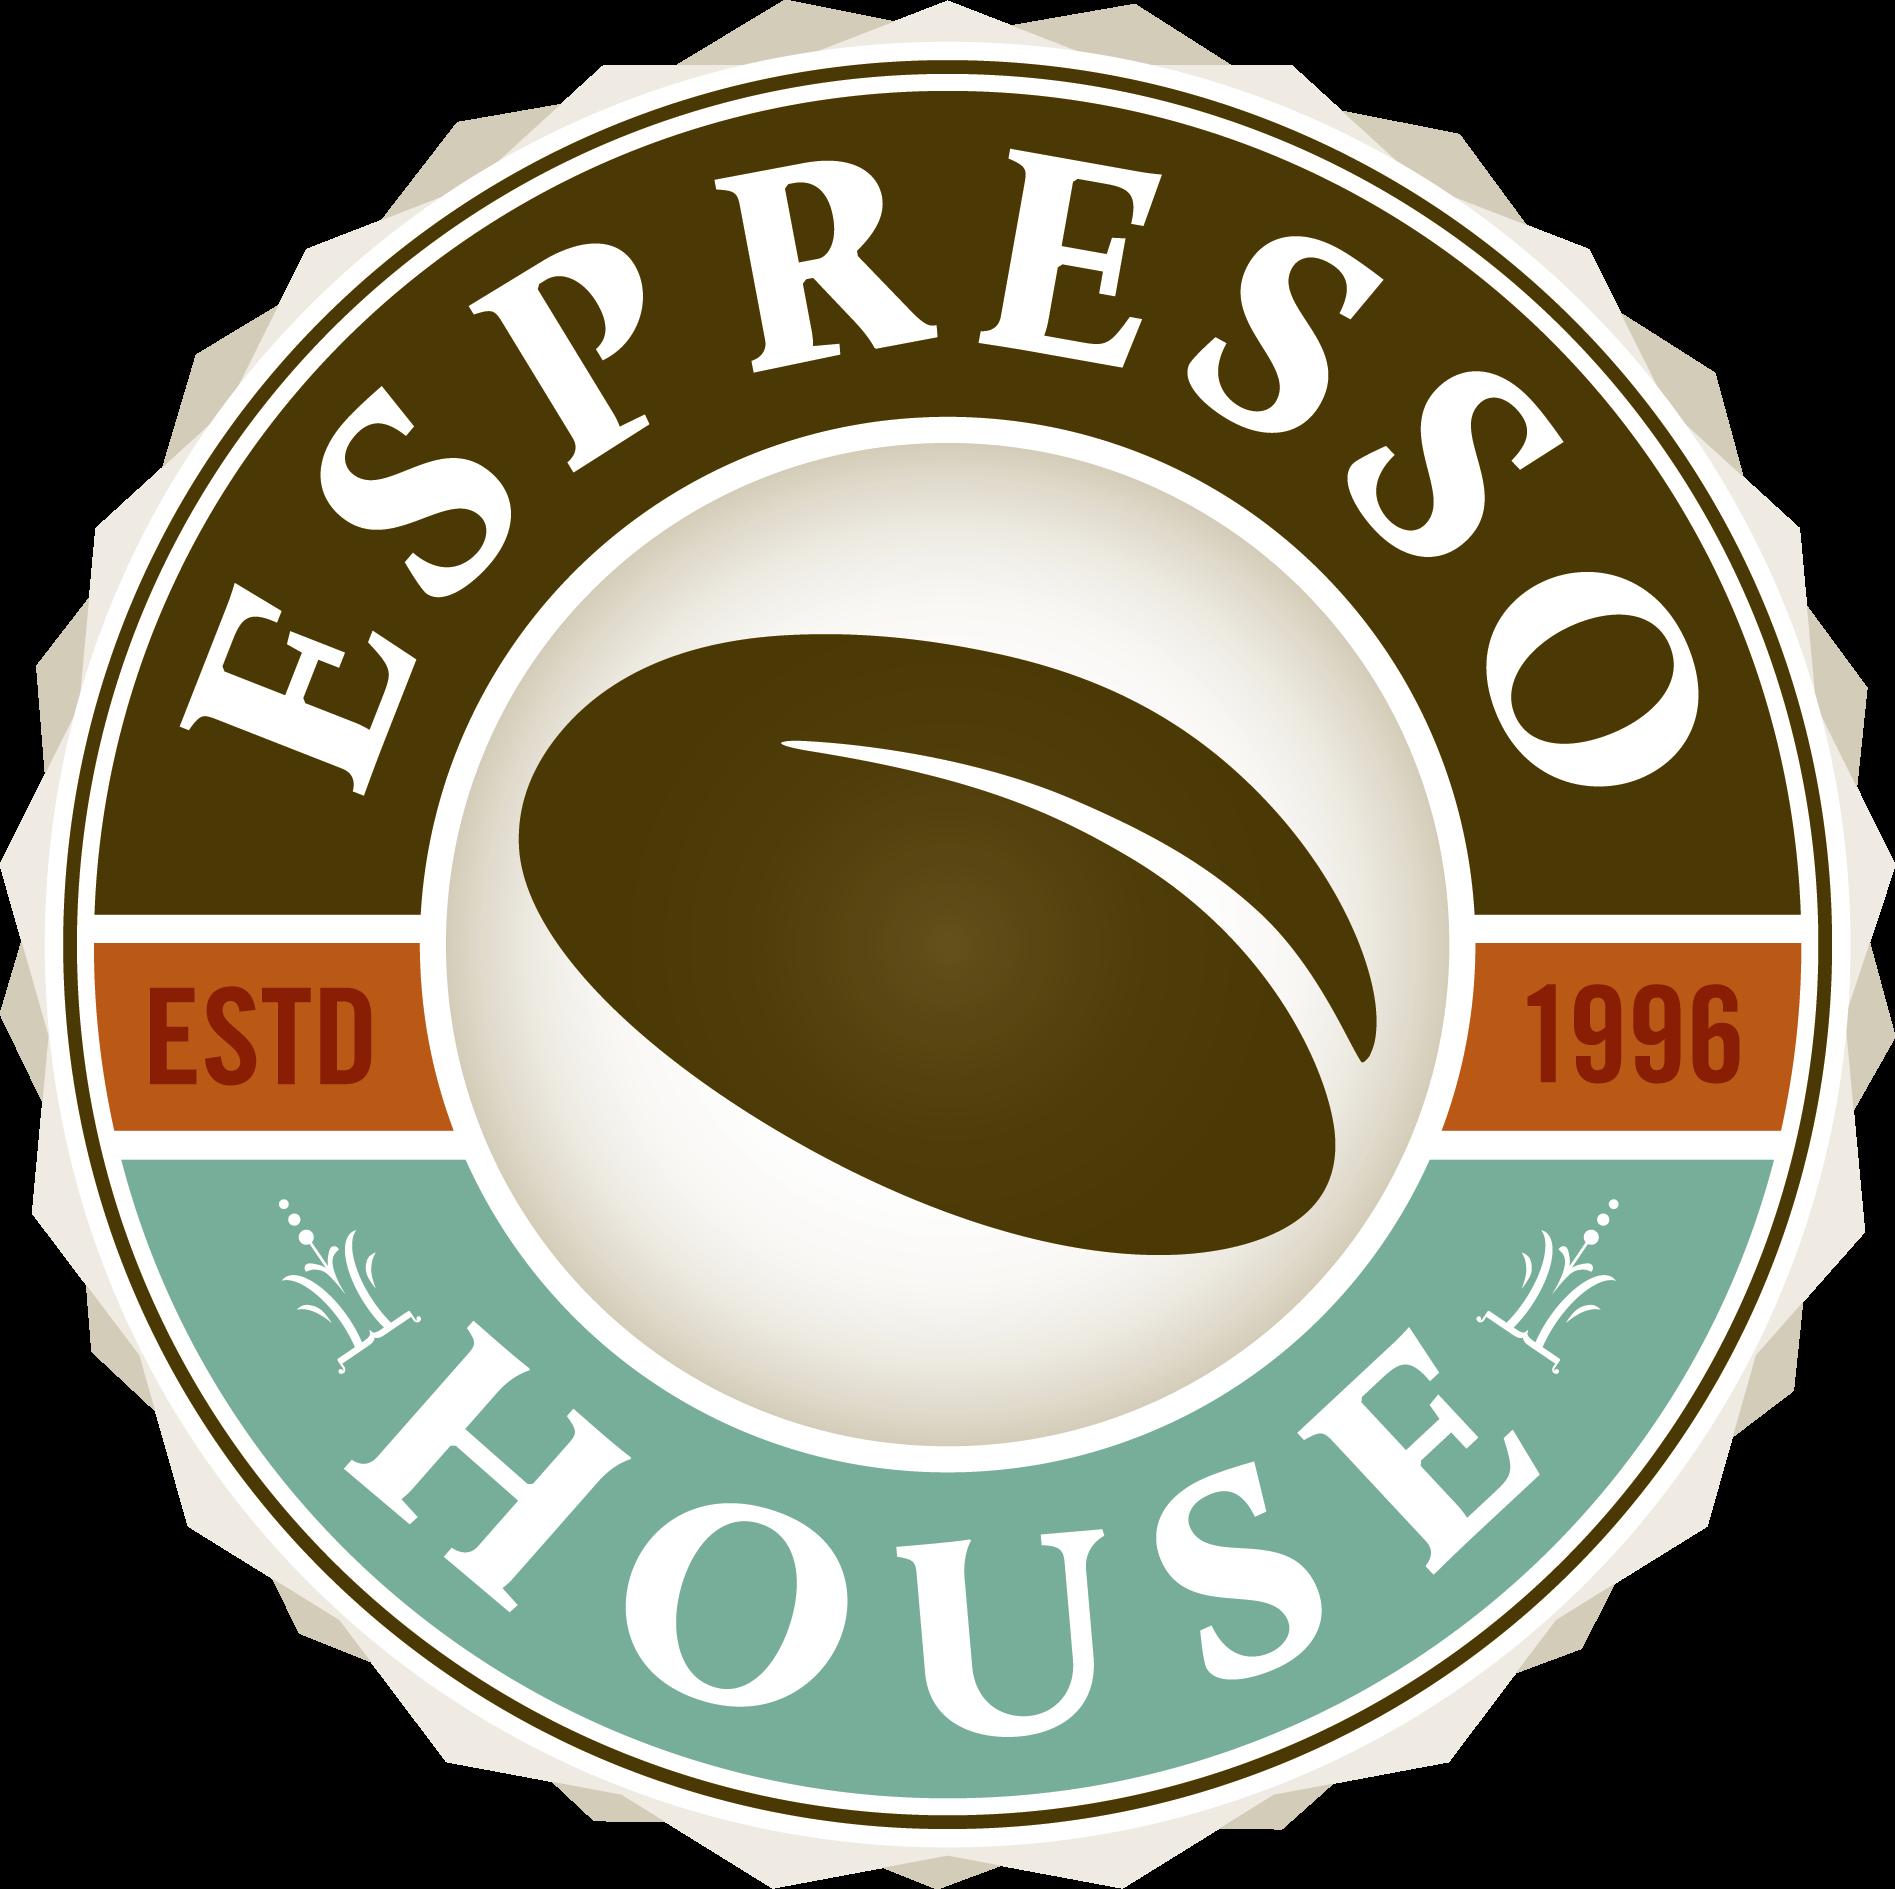 Espresso House Finland Oy logo